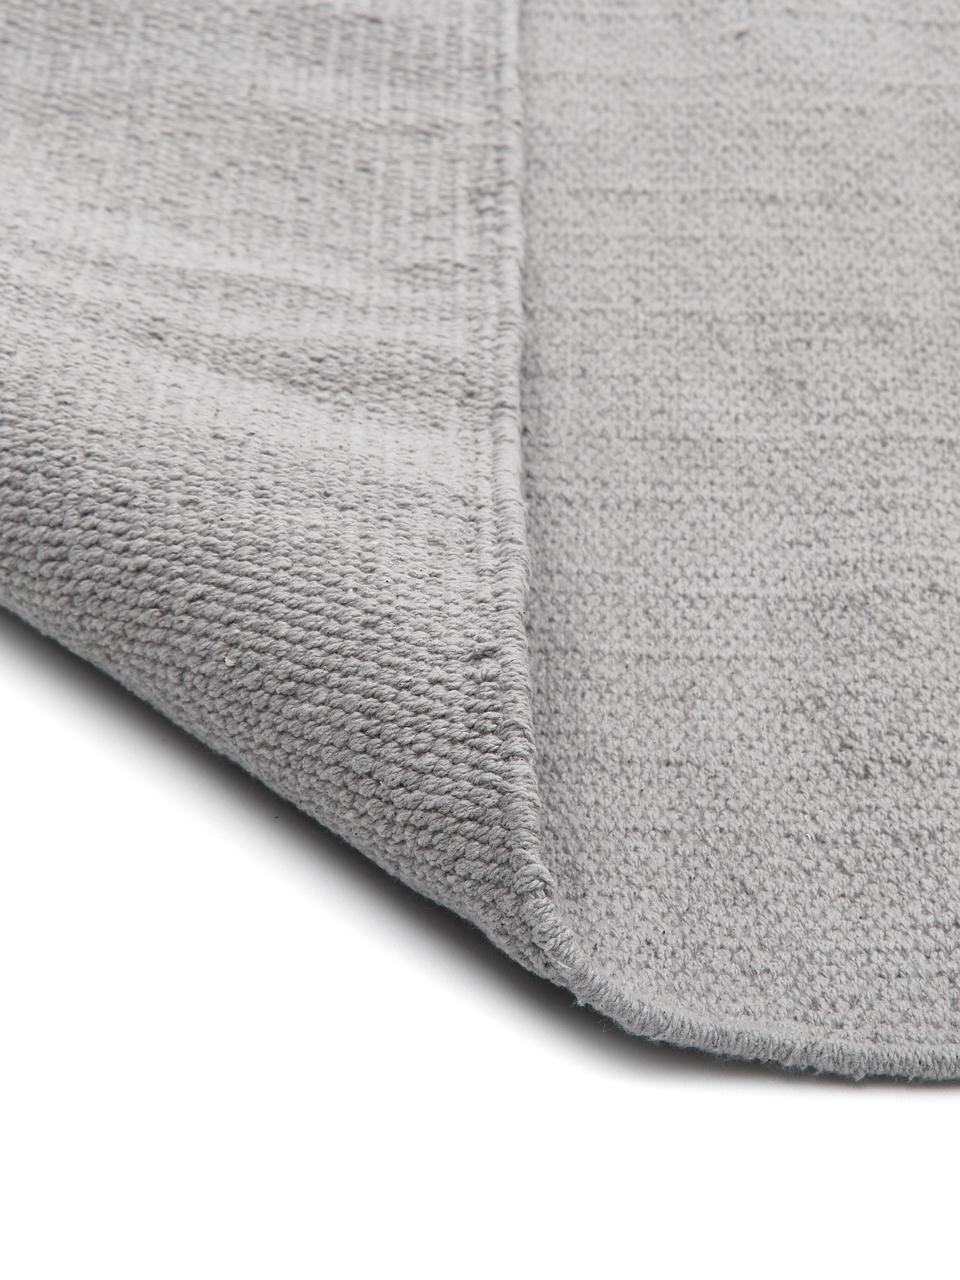 Dünner Baumwollteppich Agneta, handgewebt, 100% Baumwolle, Grau, B 200 x L 300 cm (Größe L)